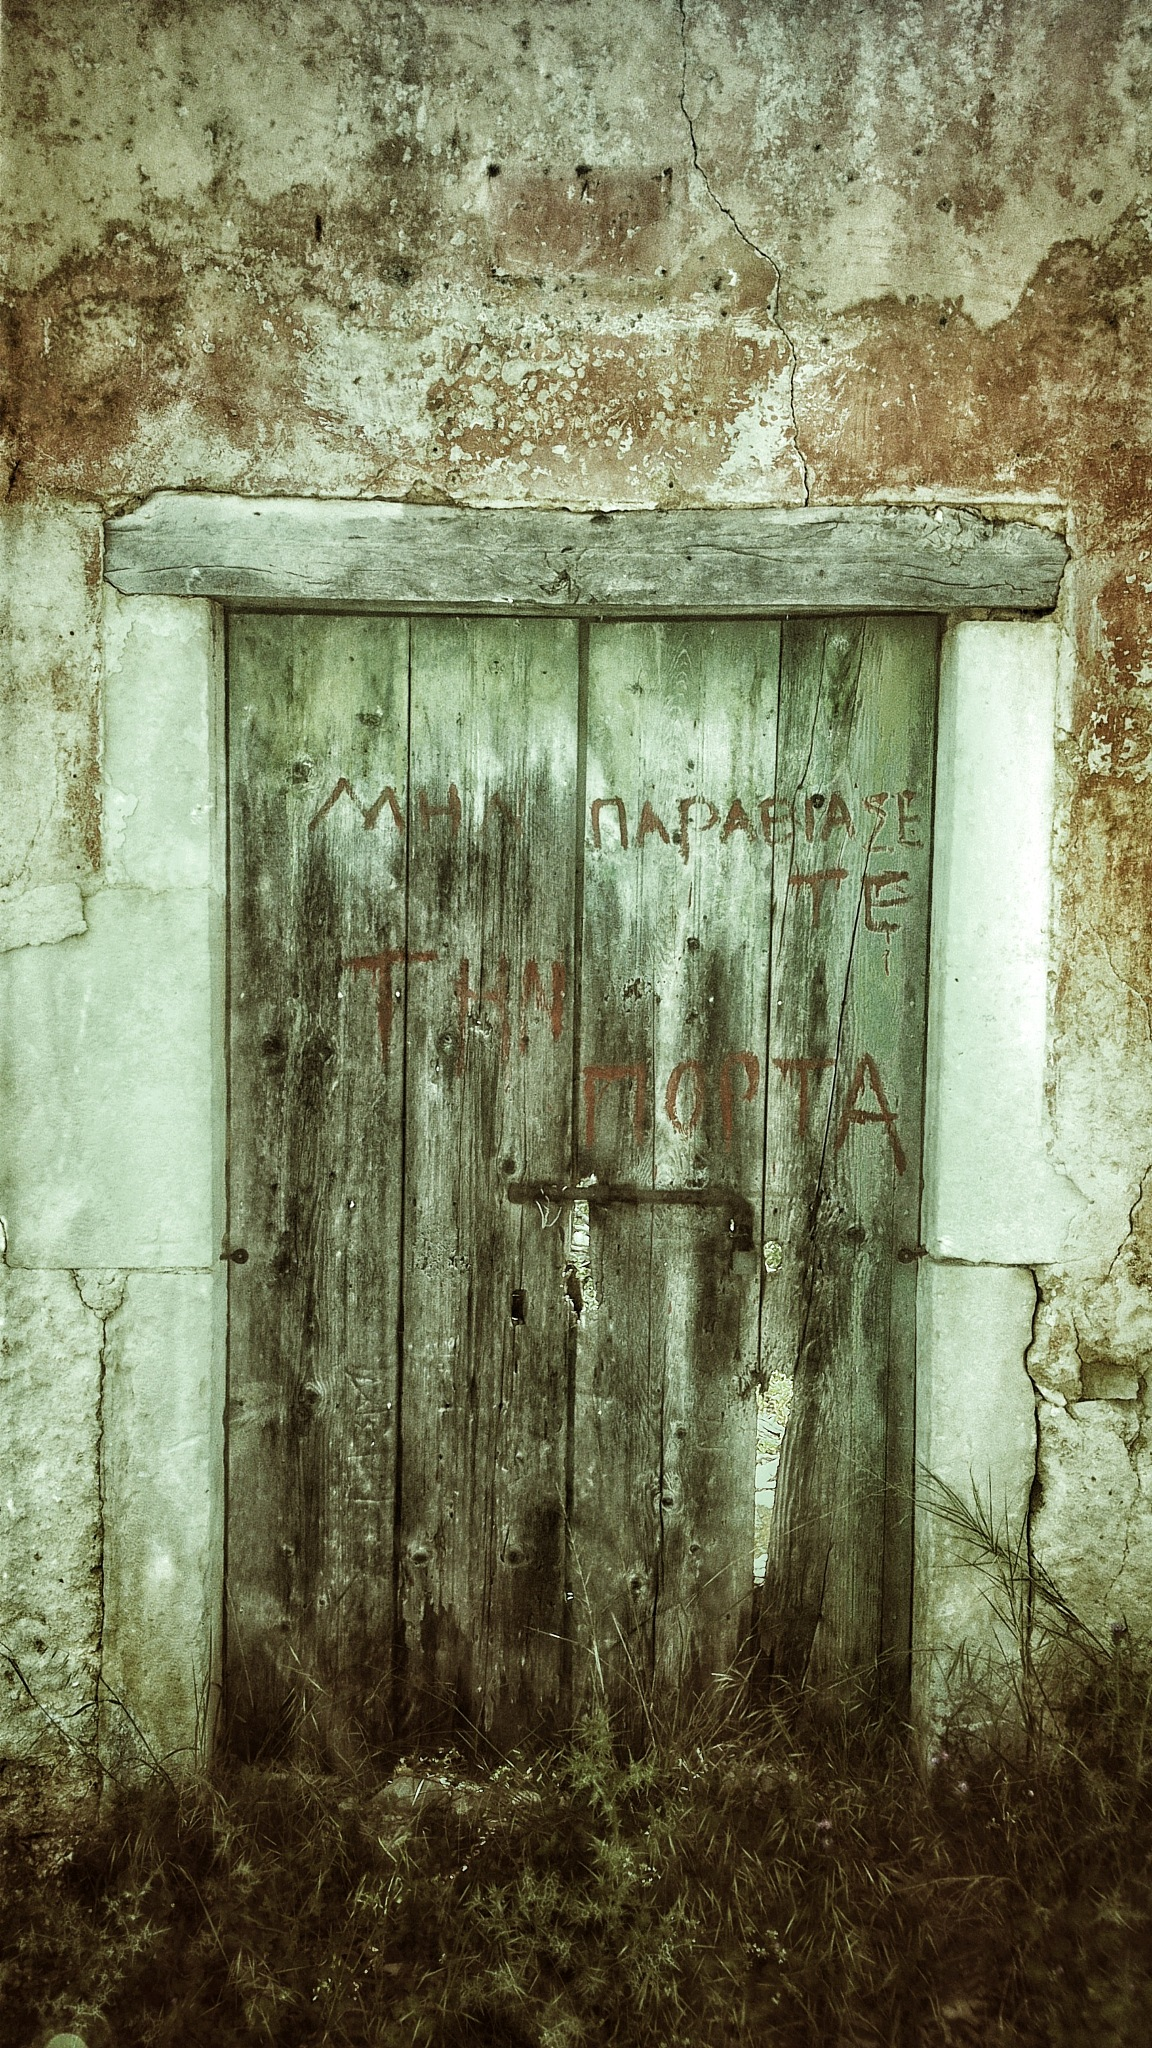 Don't open the door  by vasilis fragiskatos